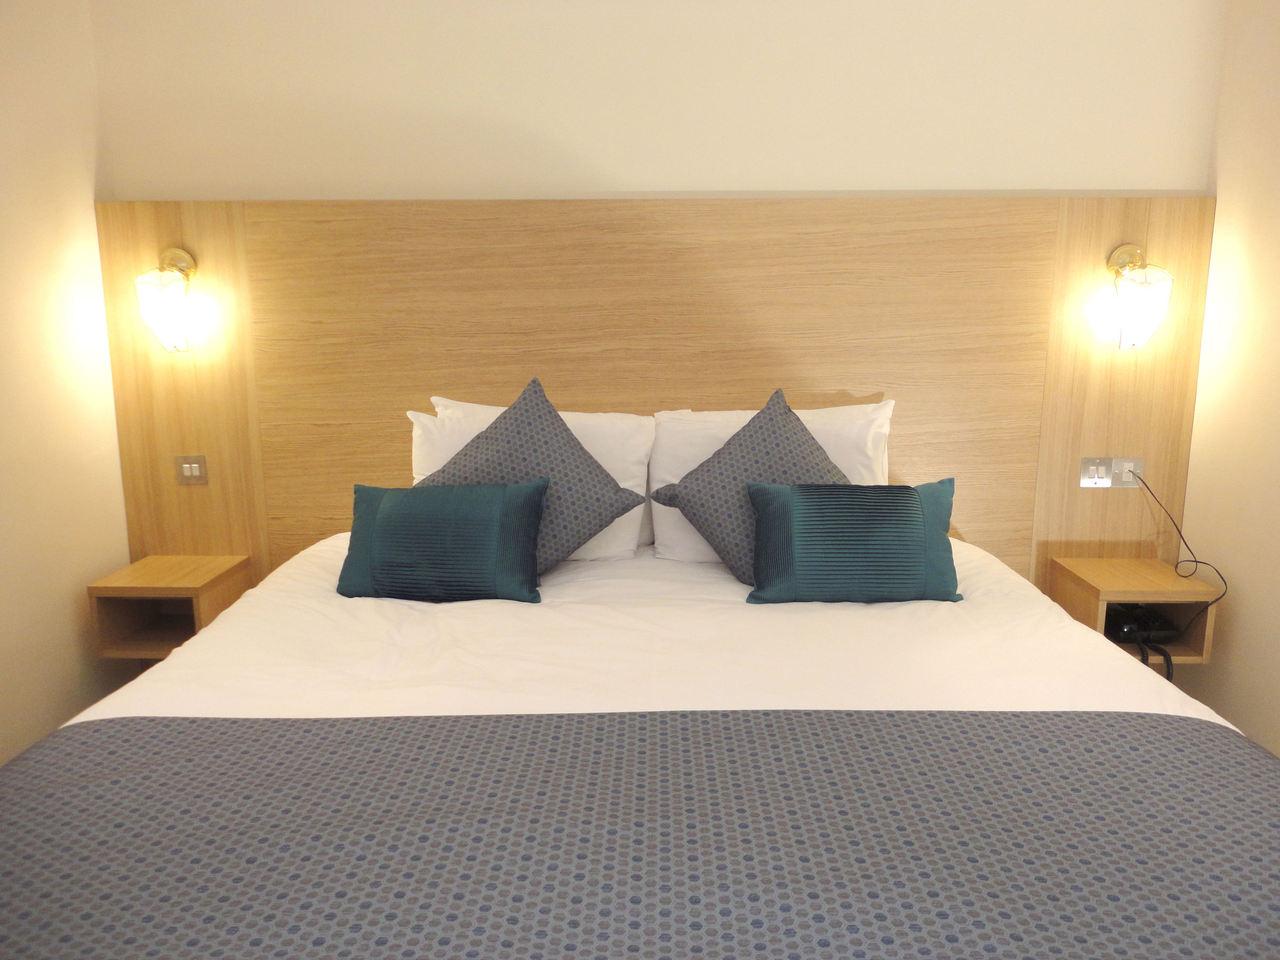 Super King size Bed - Hotel room